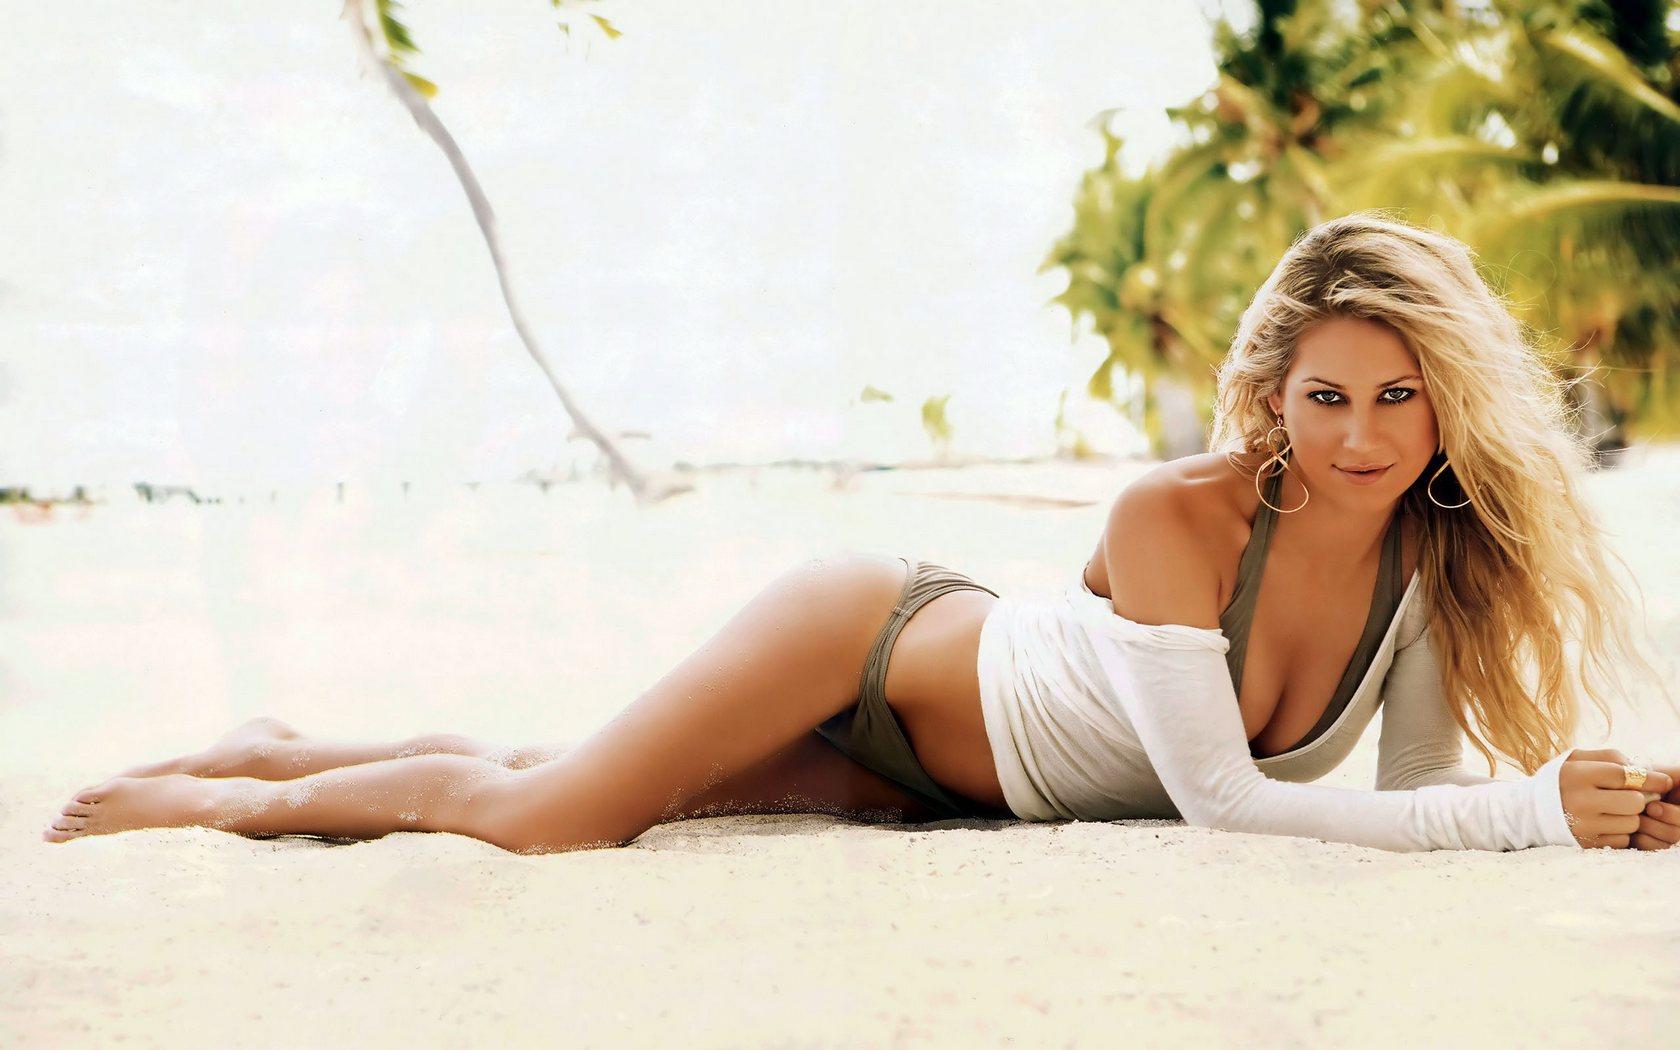 Download High quality Anna Kournikova wallpaper / Celebrities Female / 1680x1050